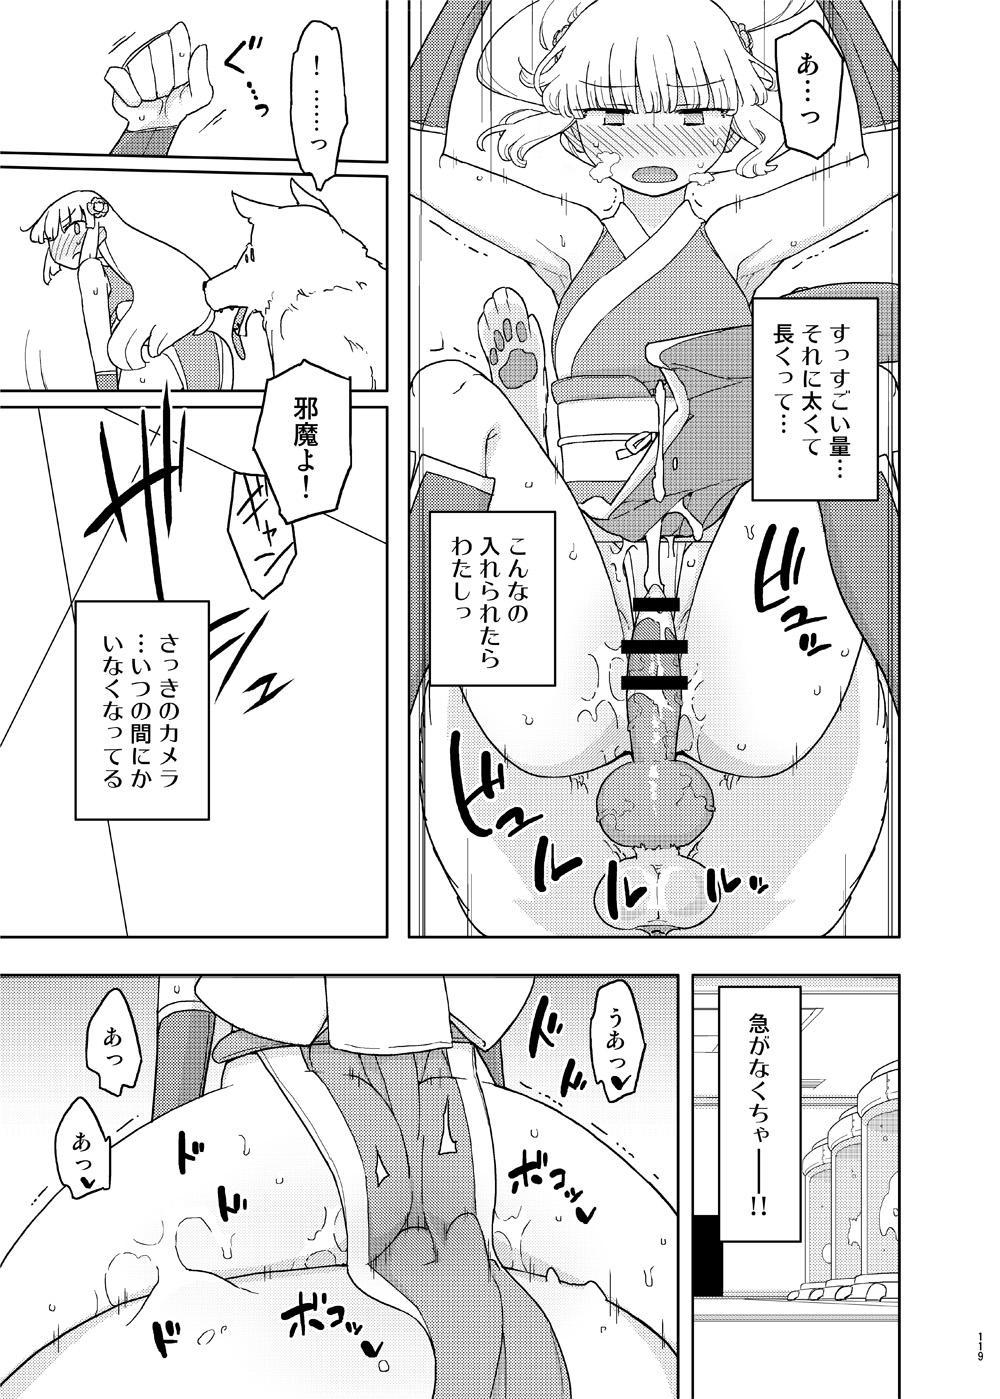 Saimin Katei Kyoushi no Inkou Seijin Muke Soushuuhen 117